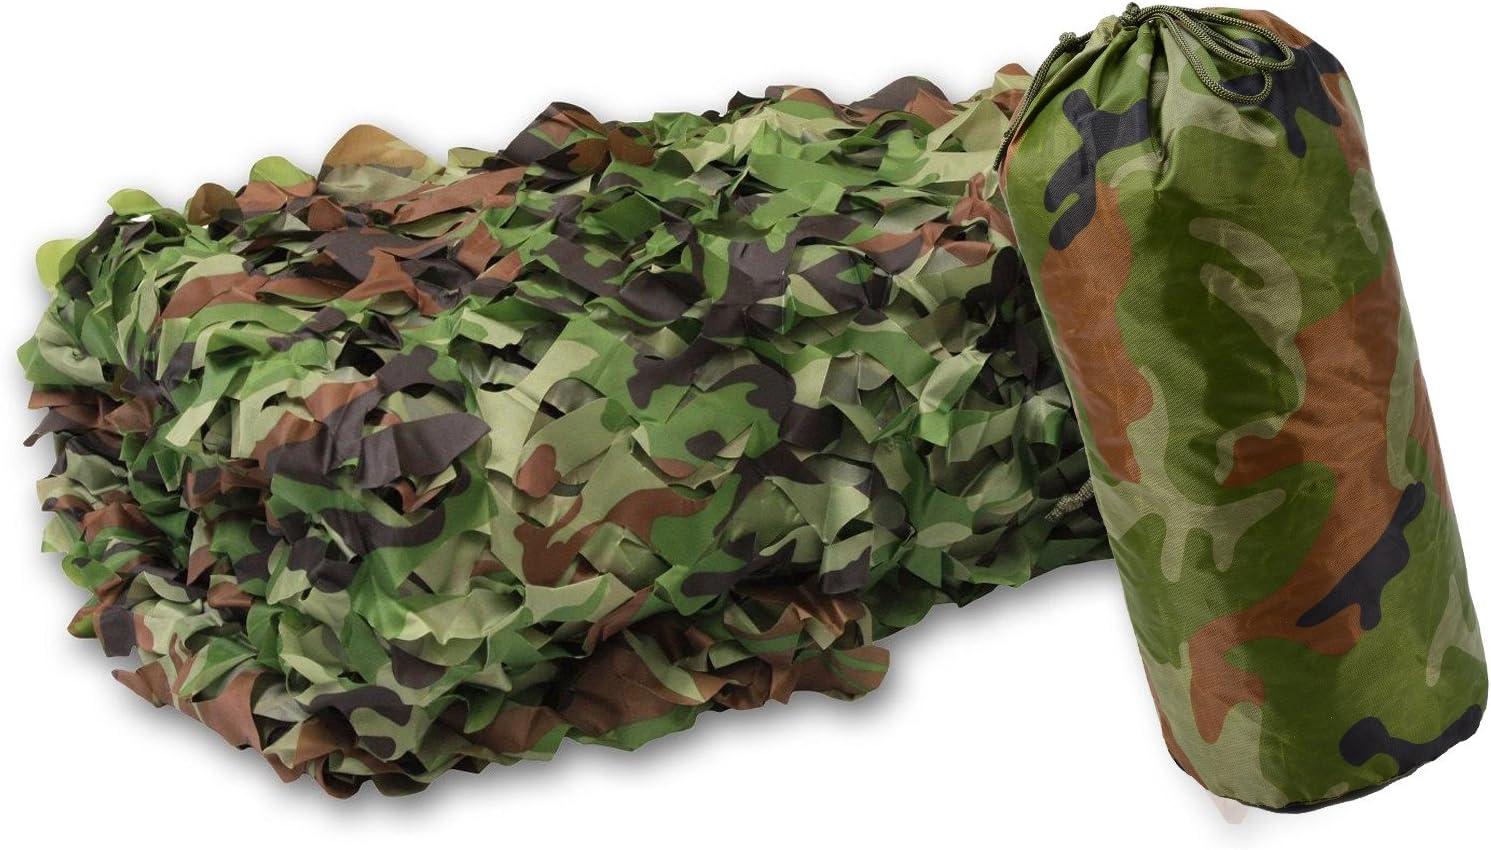 flammenhemmend Jagd Armee Outdoor wei/ß gr/ün XLORDX 3x4m 3x5m 3x6m Camouflage Netz Tarnnetz Camonet Woodland Tarnung Camo F/ür Waldlandschaft